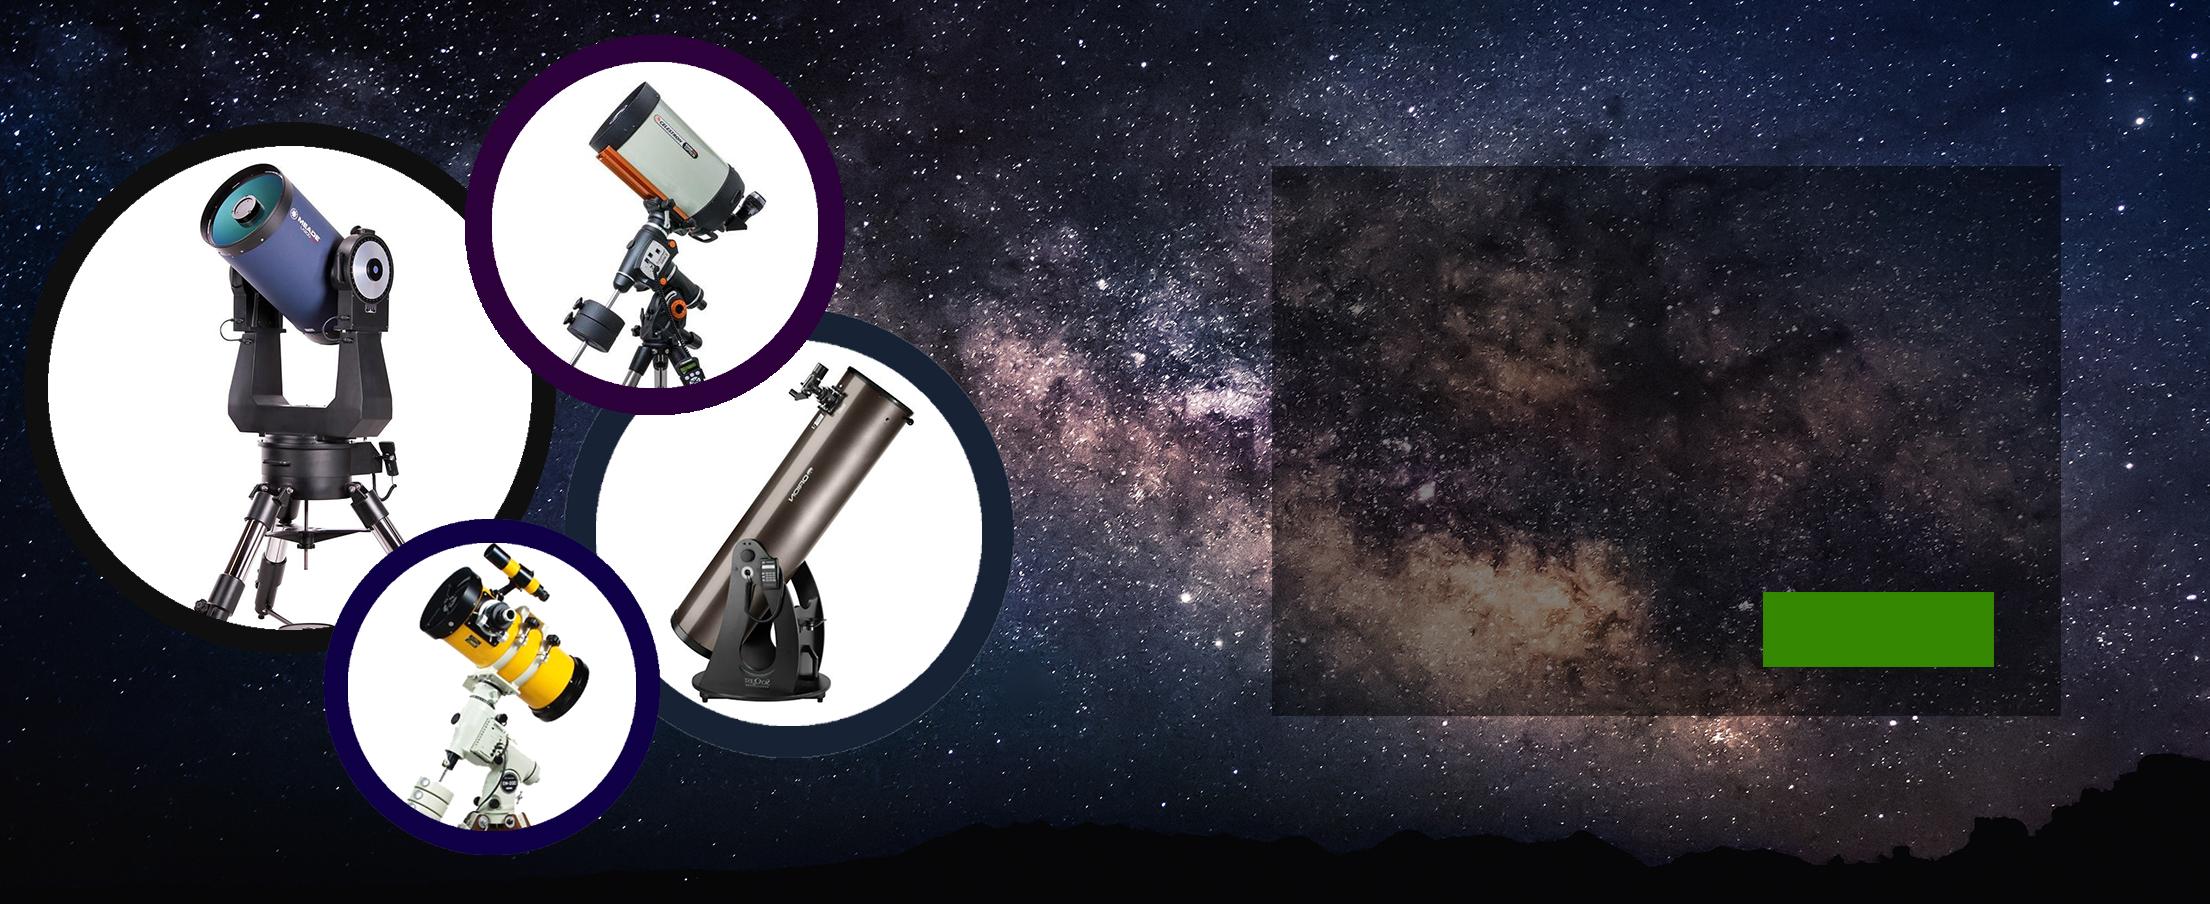 Astronomy Store Telescopes India | Telescope Shop India